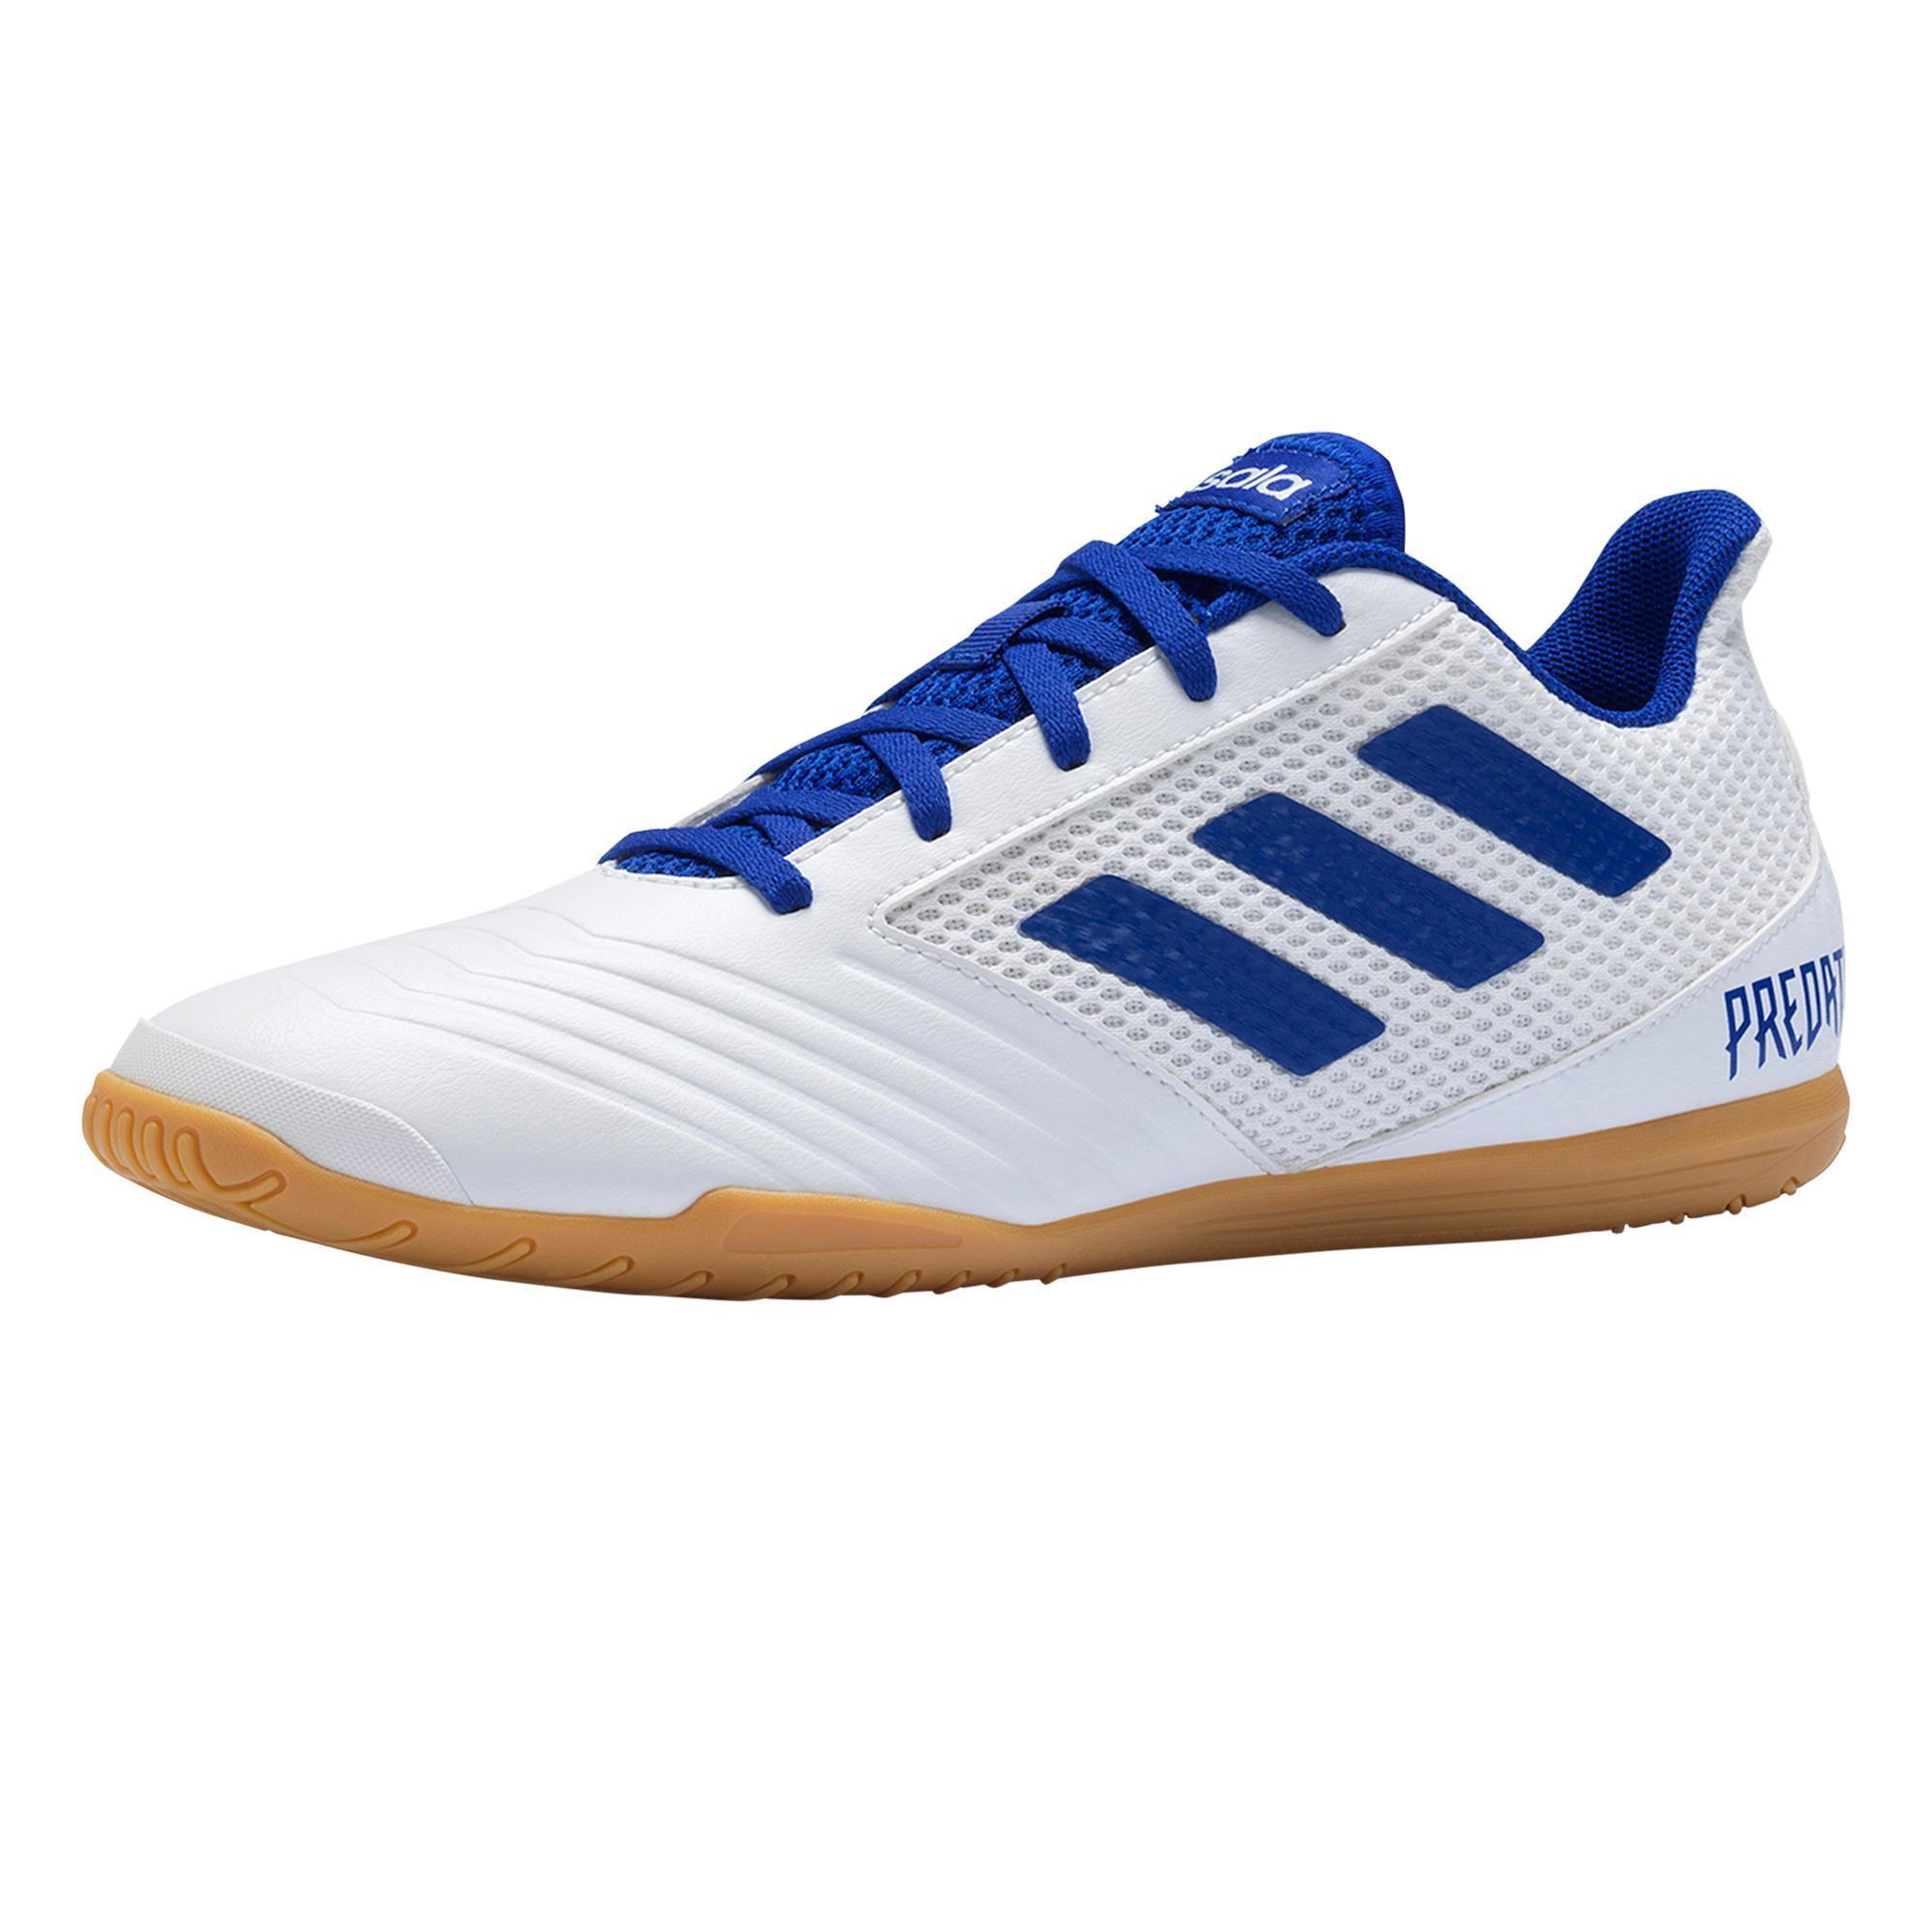 Adidas Zaalvoetbalschoenen Predator Tango 19.4 wit/blauw